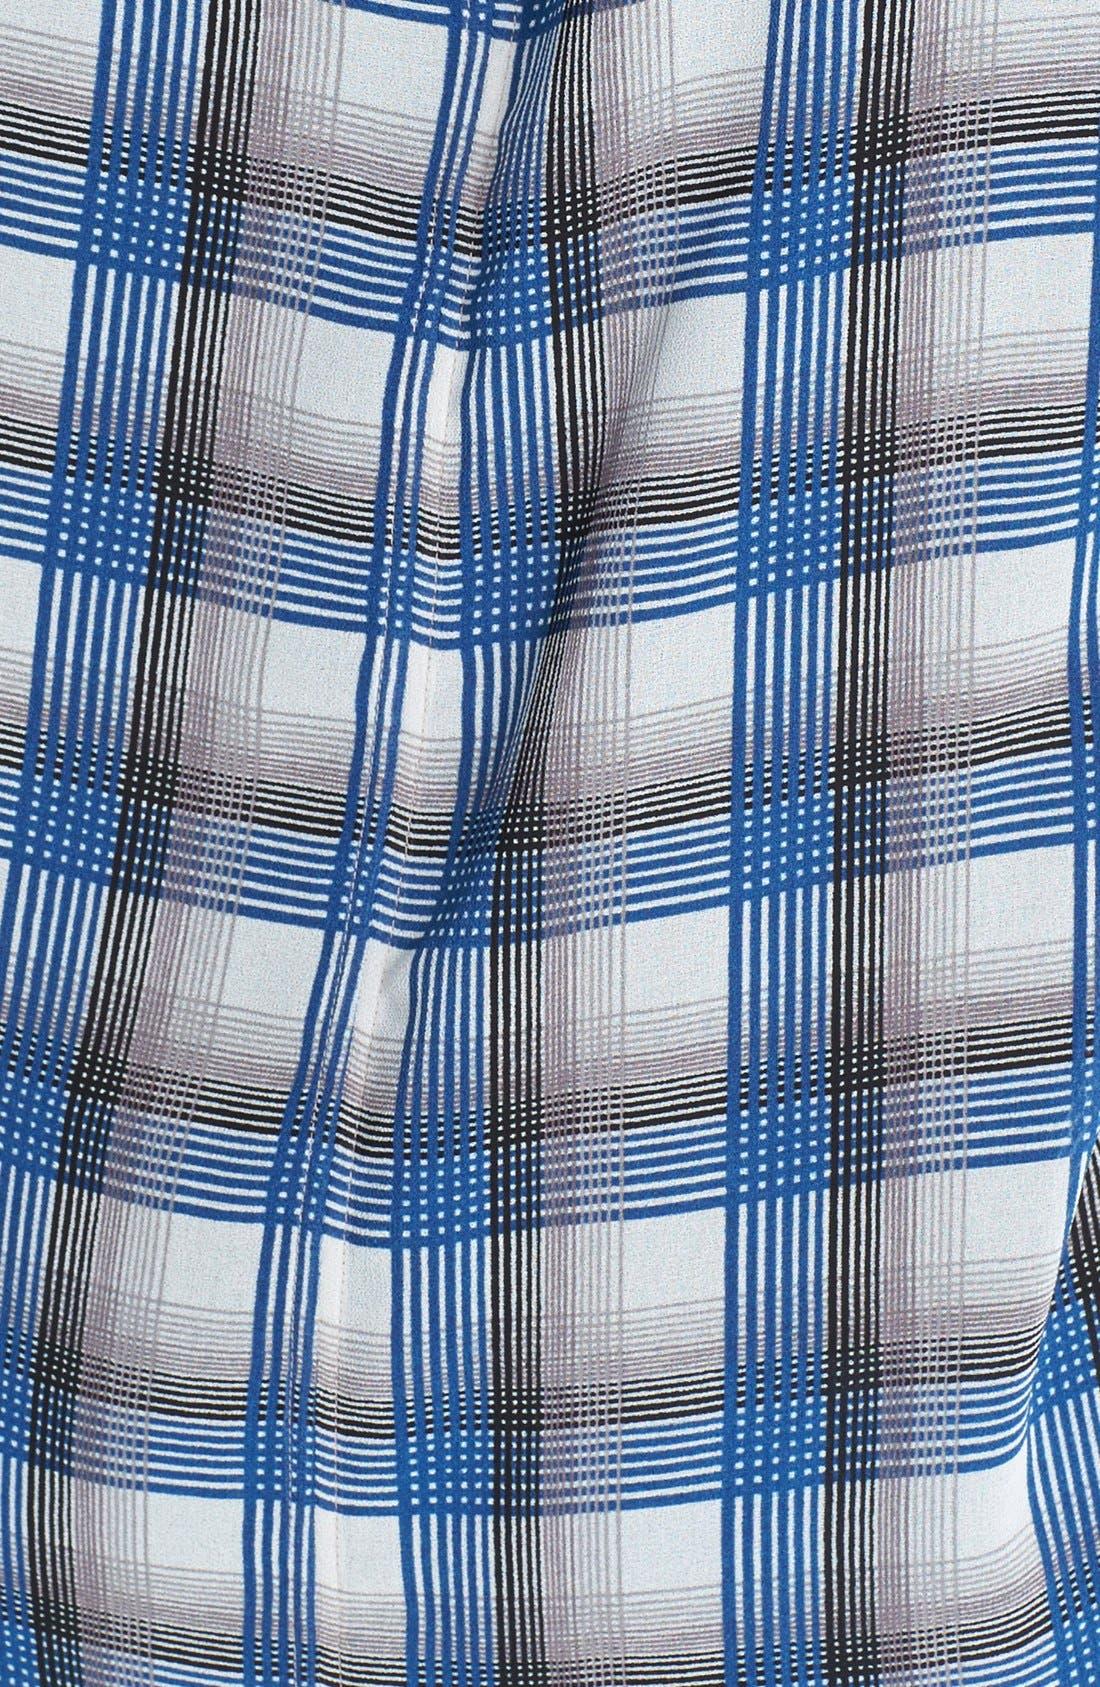 Alternate Image 3  - Caslon® Sheer Woven Plaid Tee (Regular & Petite)